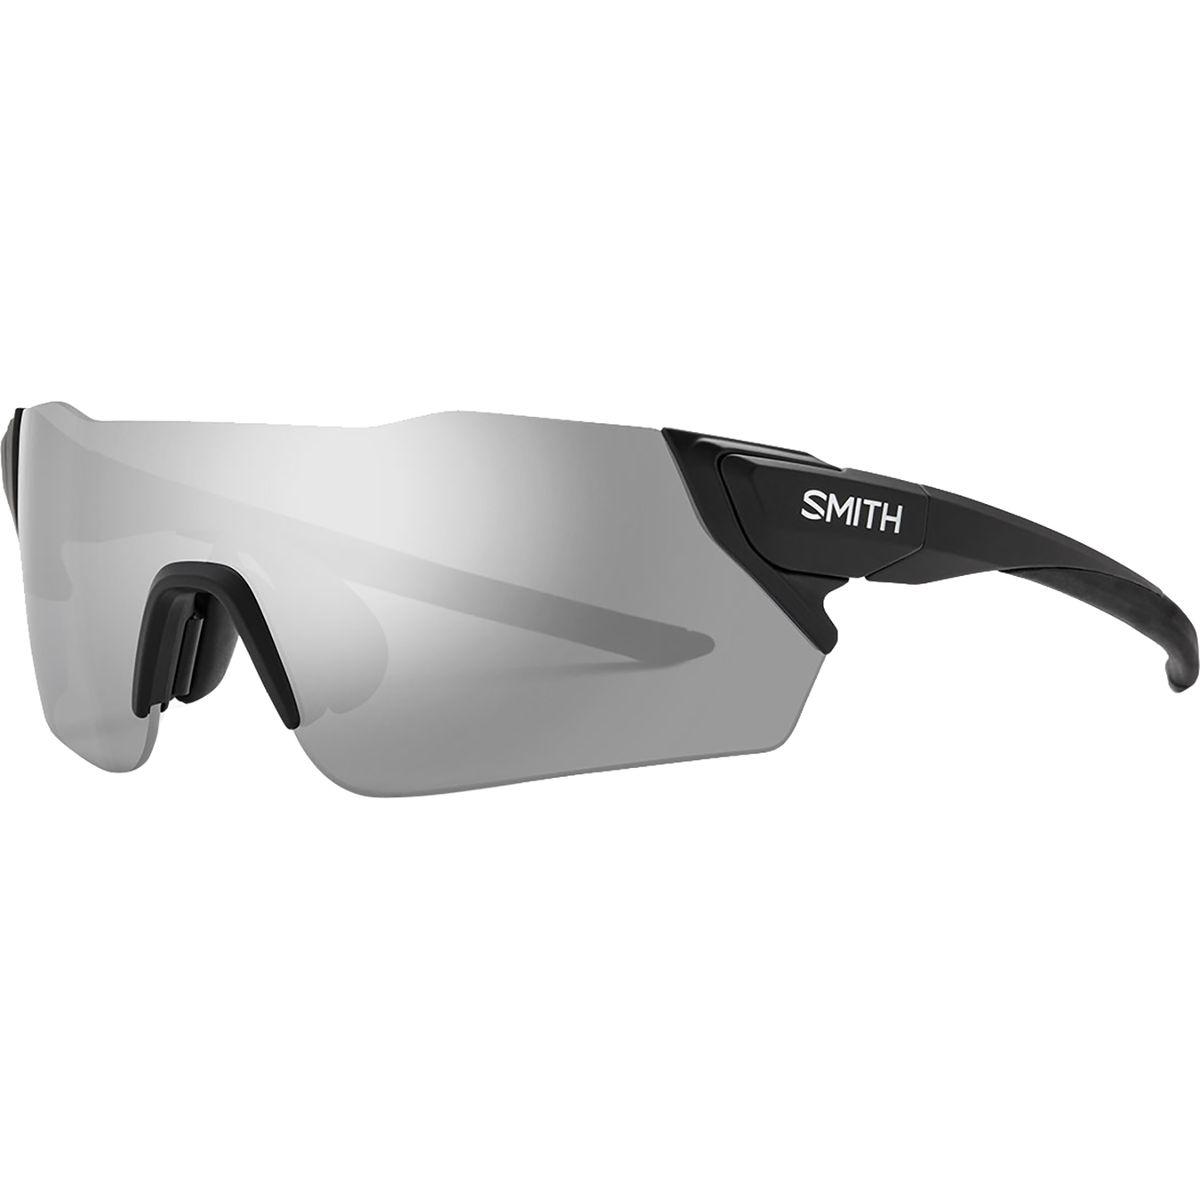 32694faa82 Smith Optics Chromapop Sunglasses